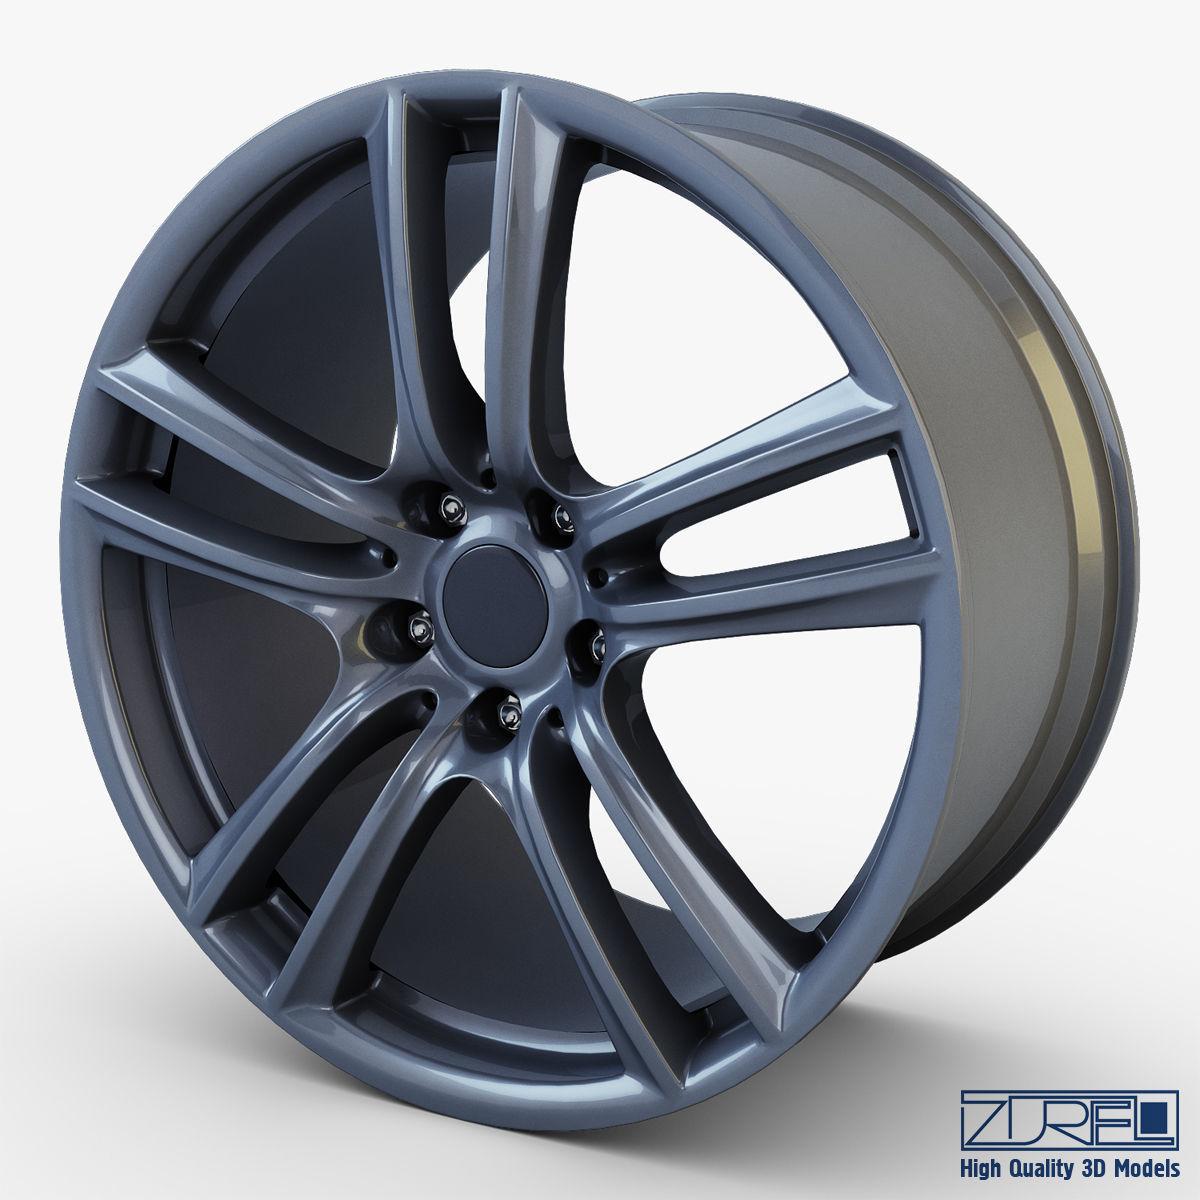 Style 303 wheel ferric gray Mid Poly